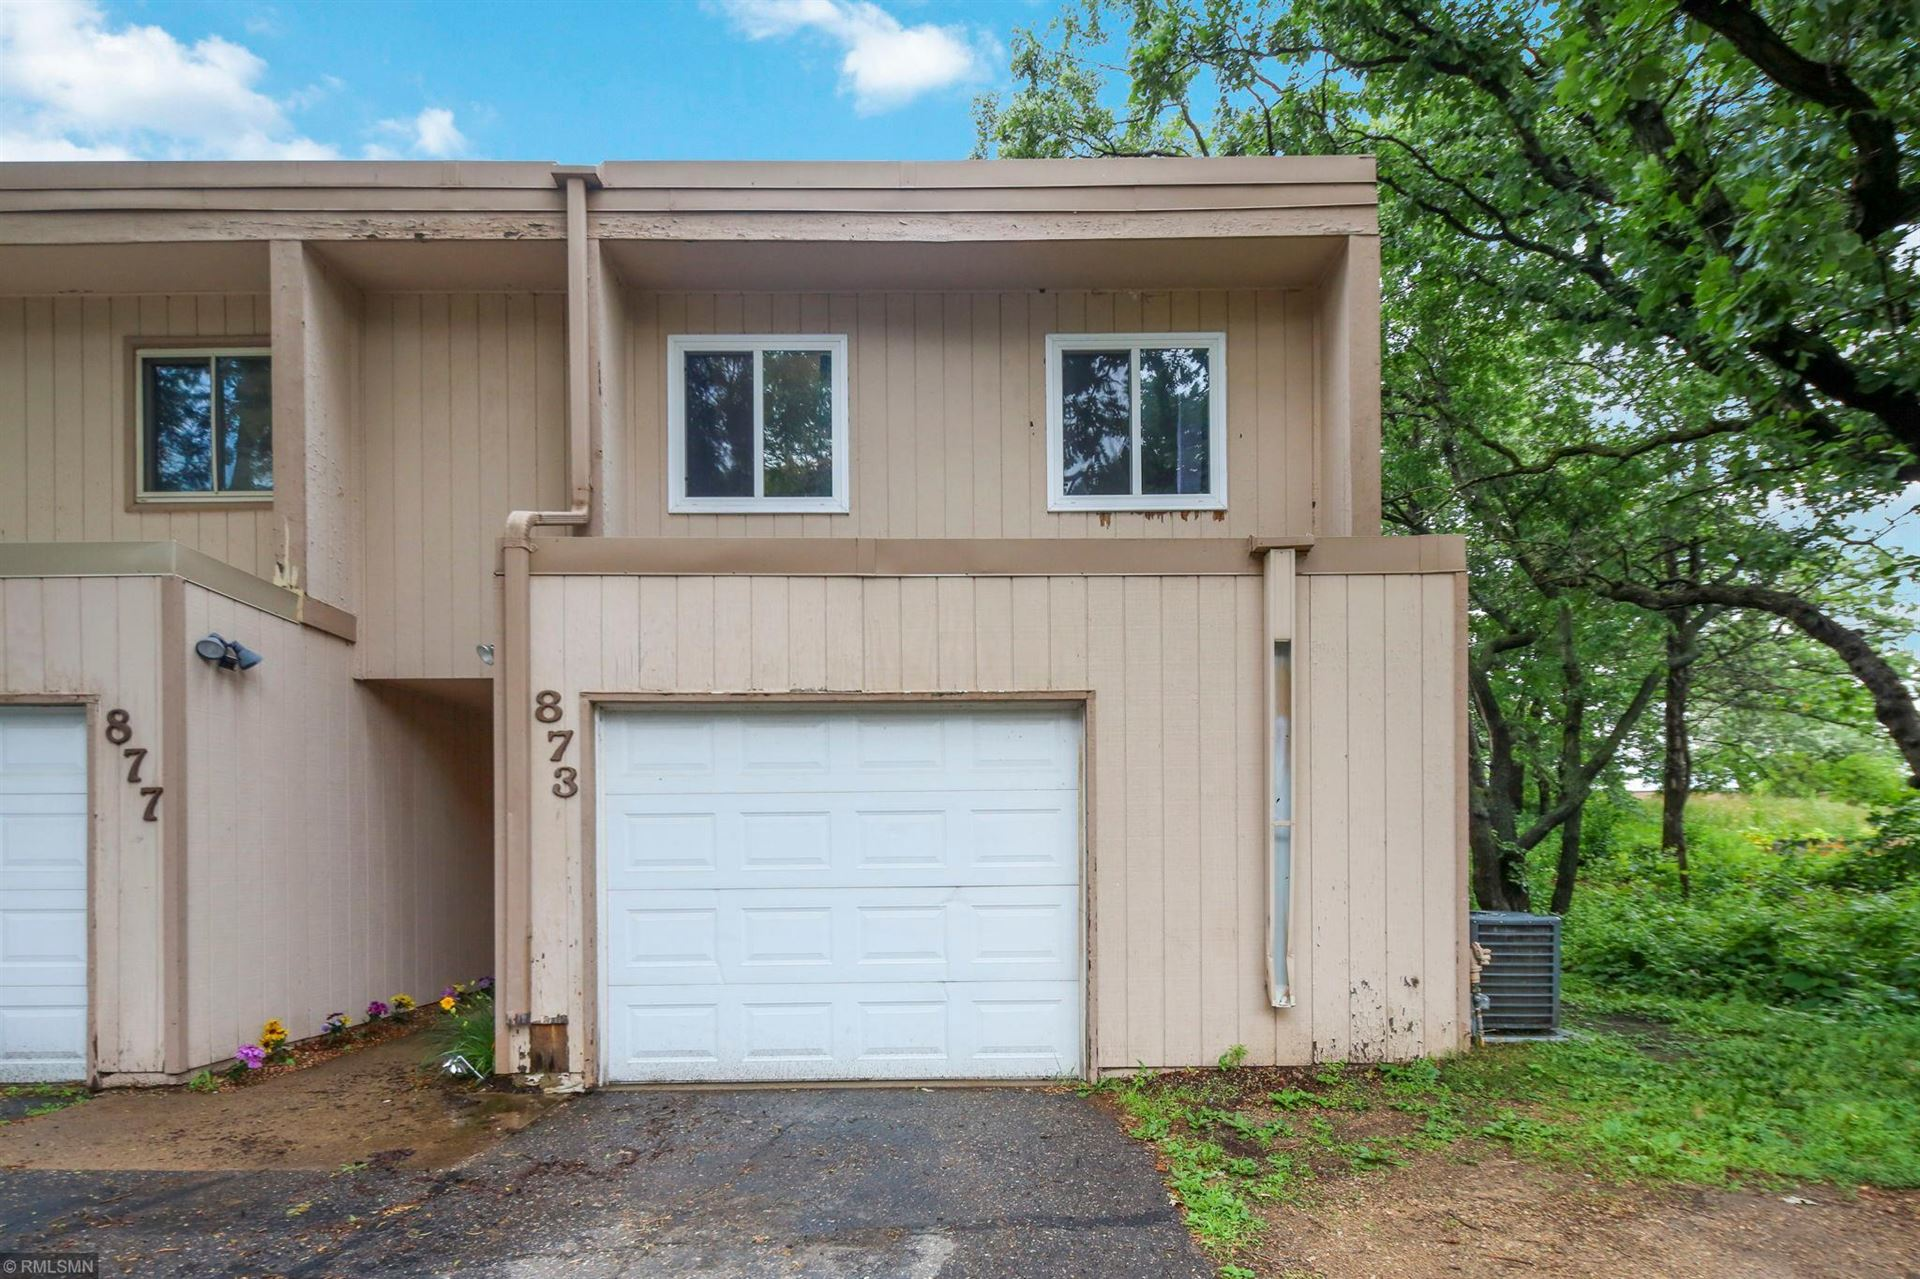 873 120th Lane NW, Coon Rapids, MN 55448 - MLS#: 5615203